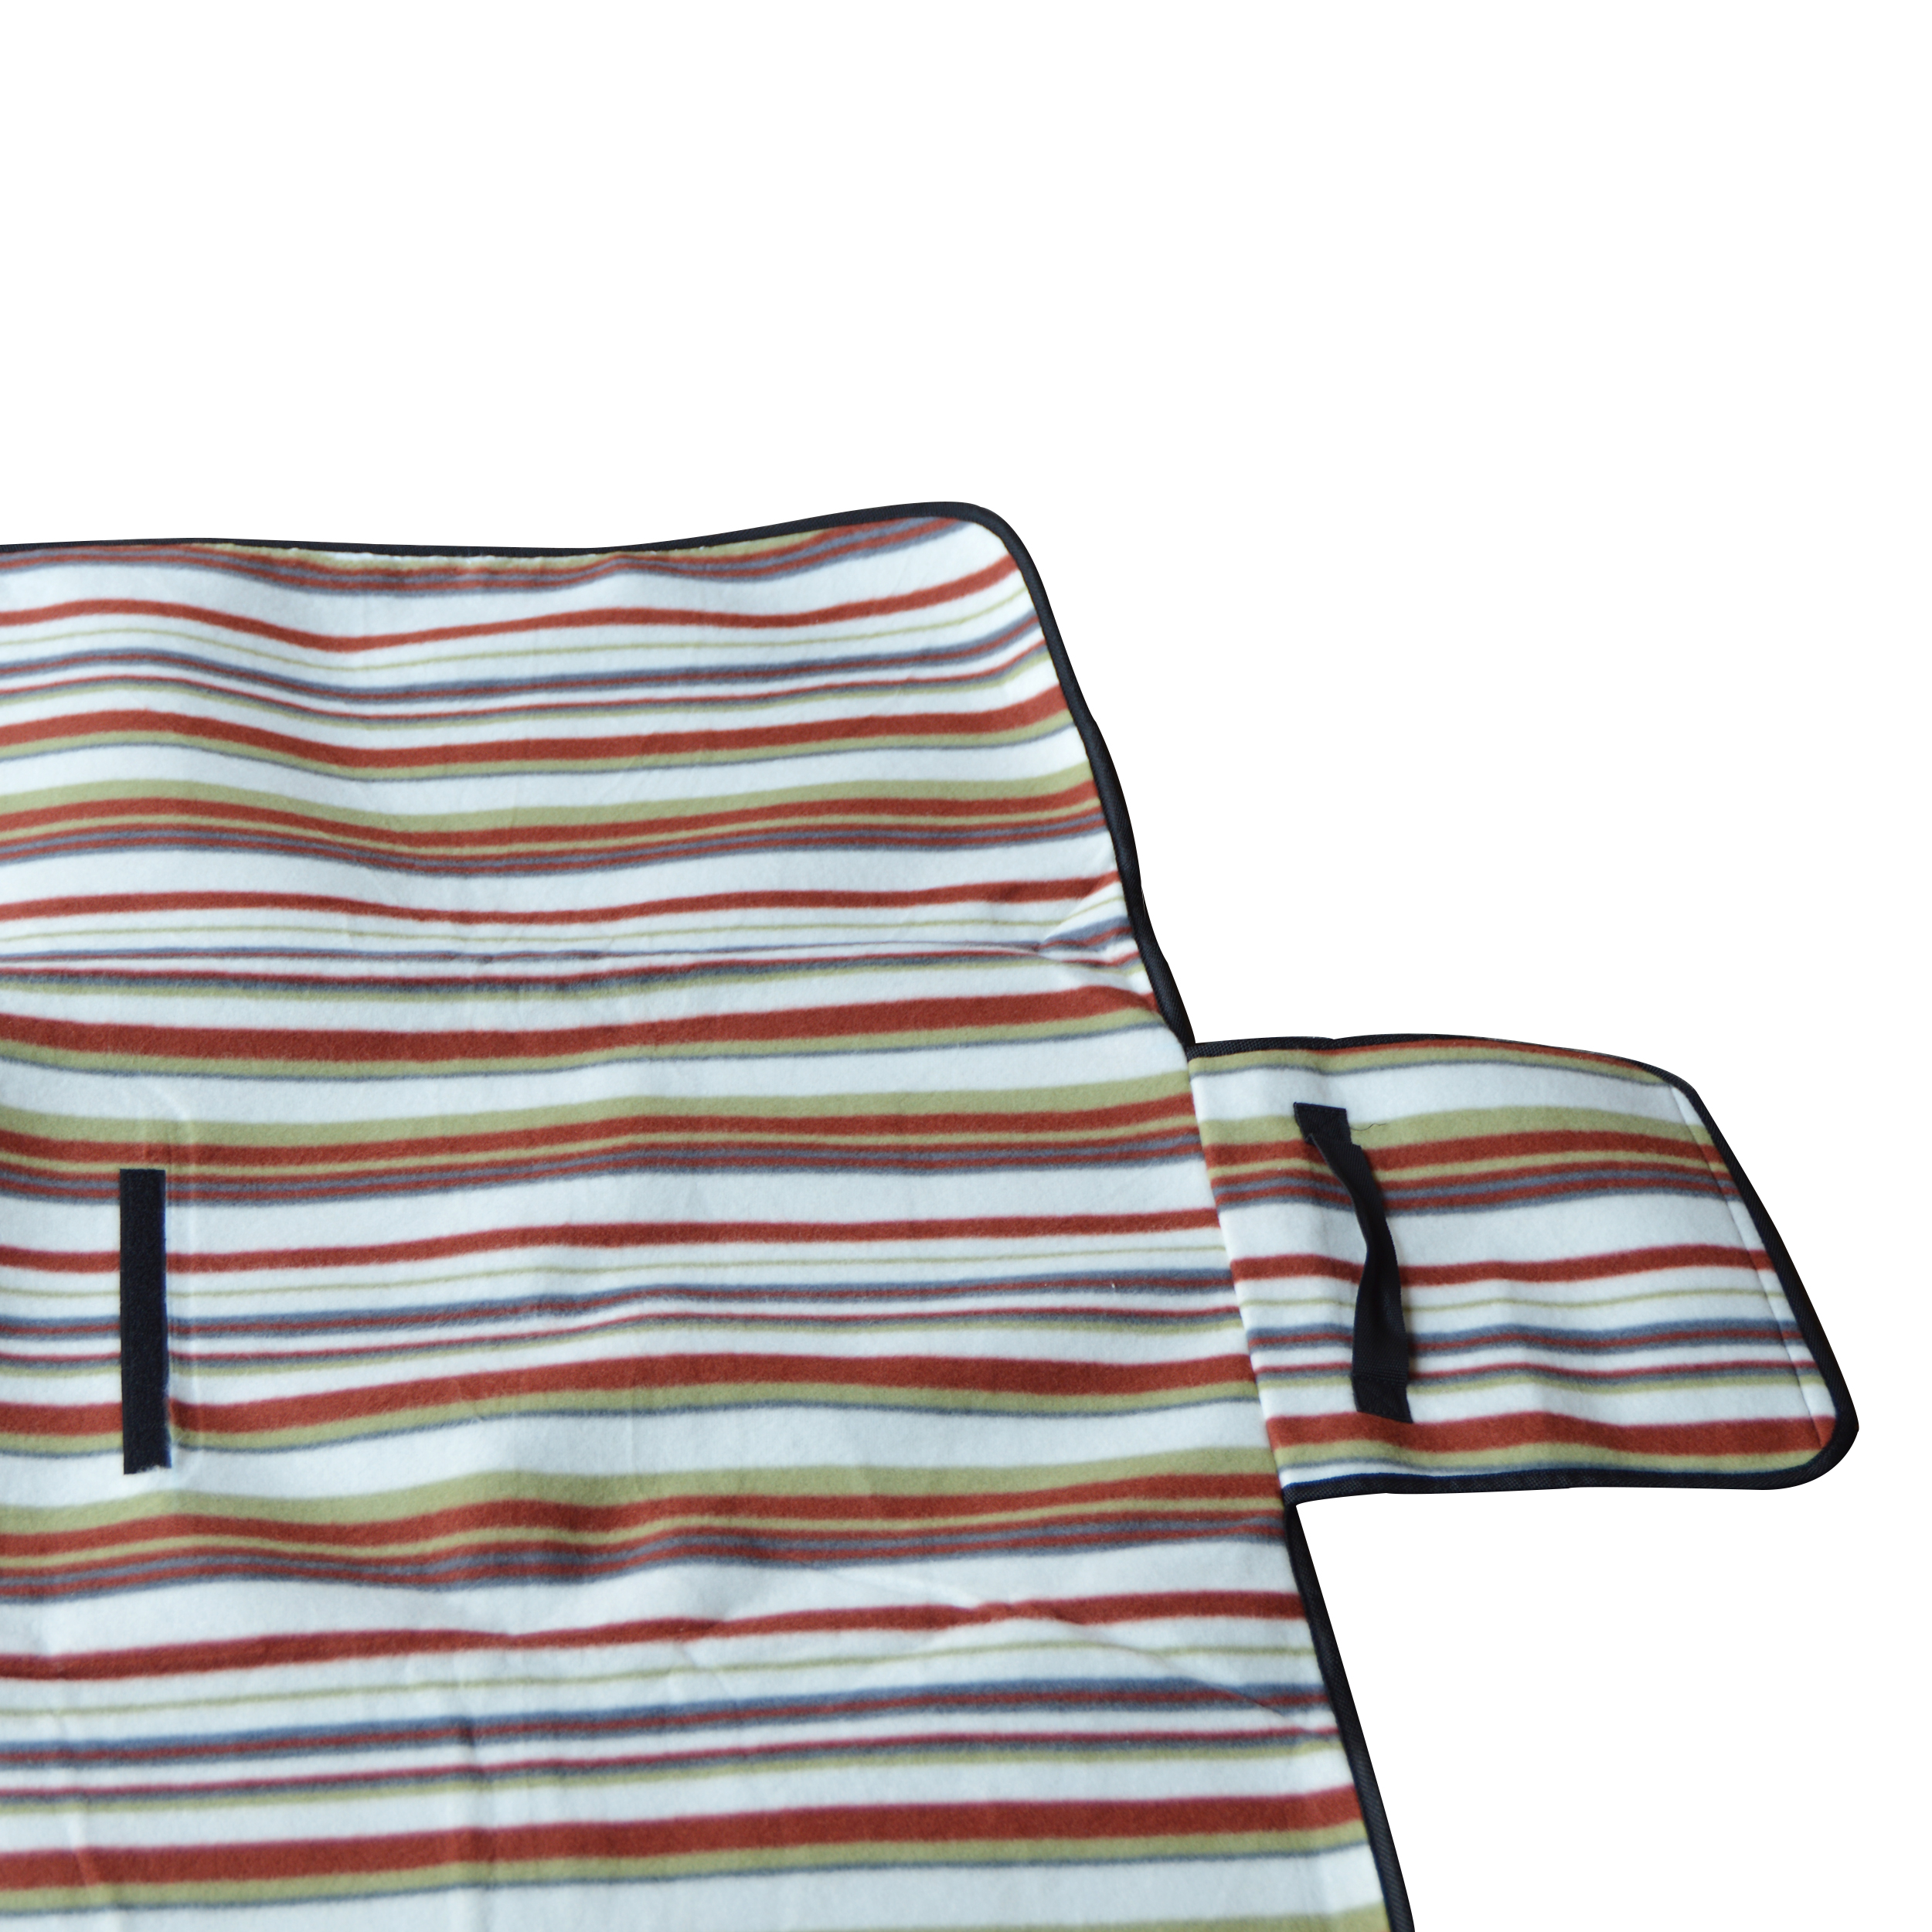 Ocean5 Picknickdecke - 200x200cm - Streifen